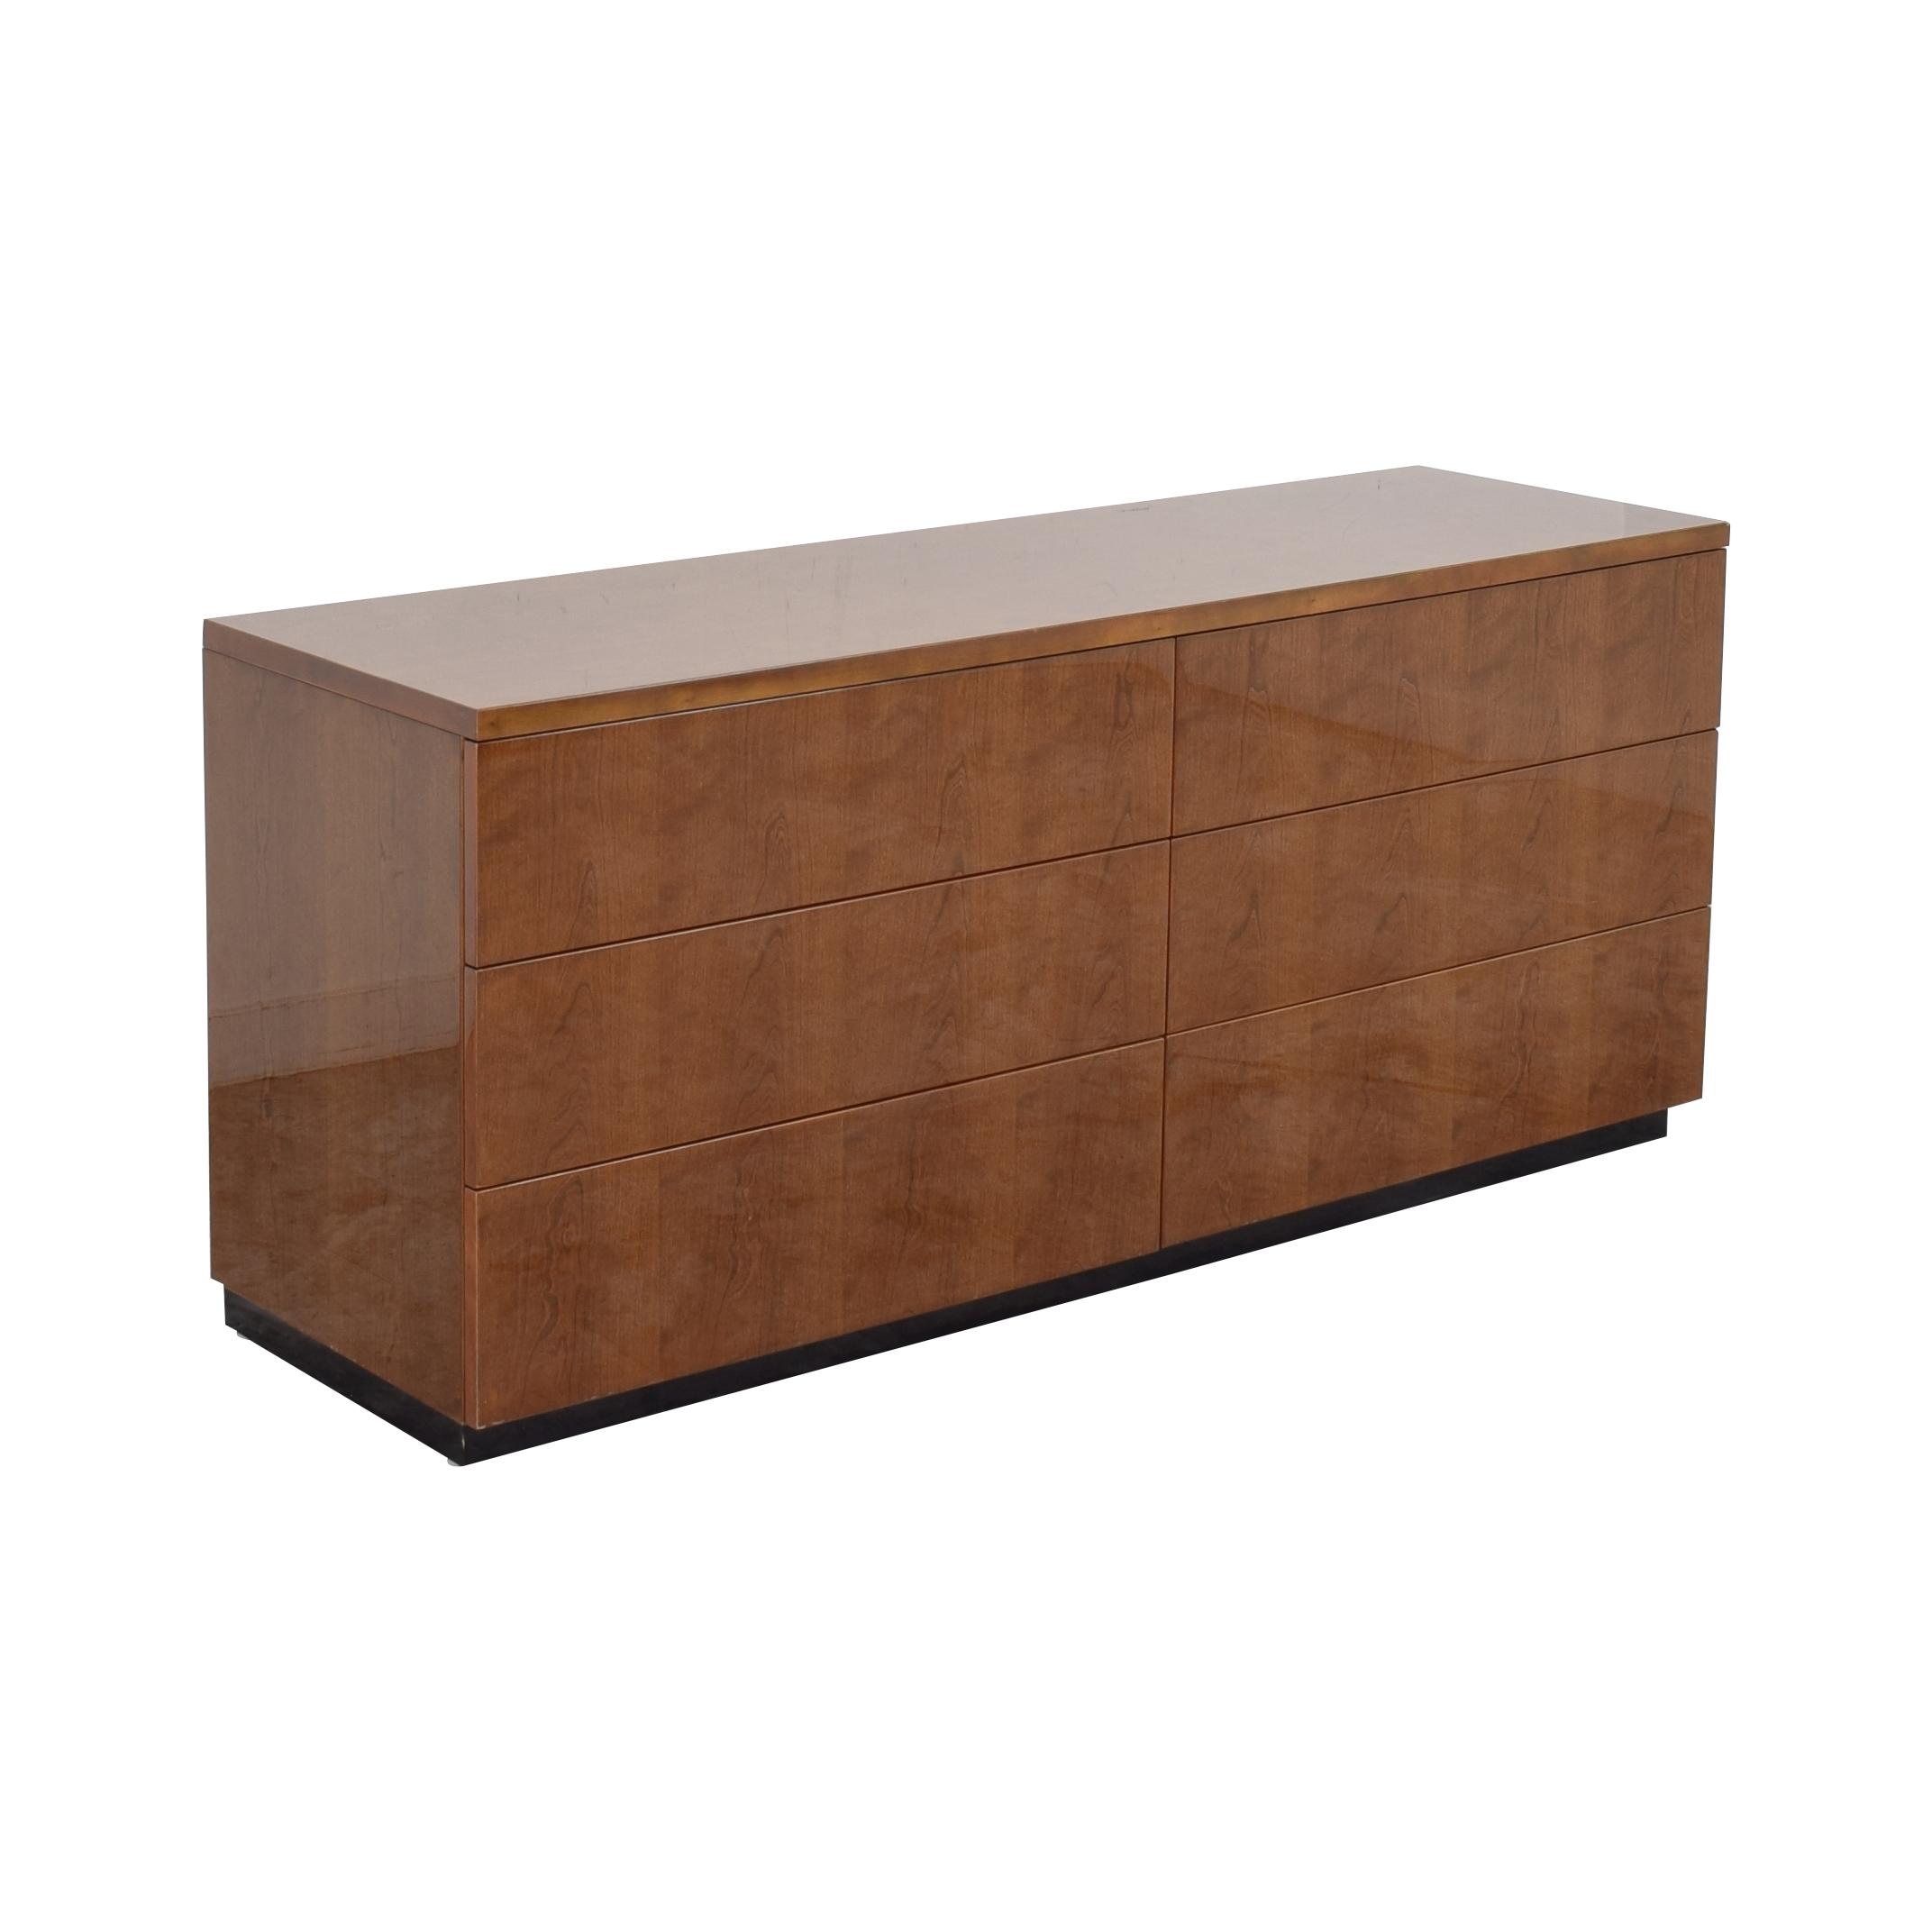 Henredon Furniture Henredon Furniture Six Drawer Dresser brown